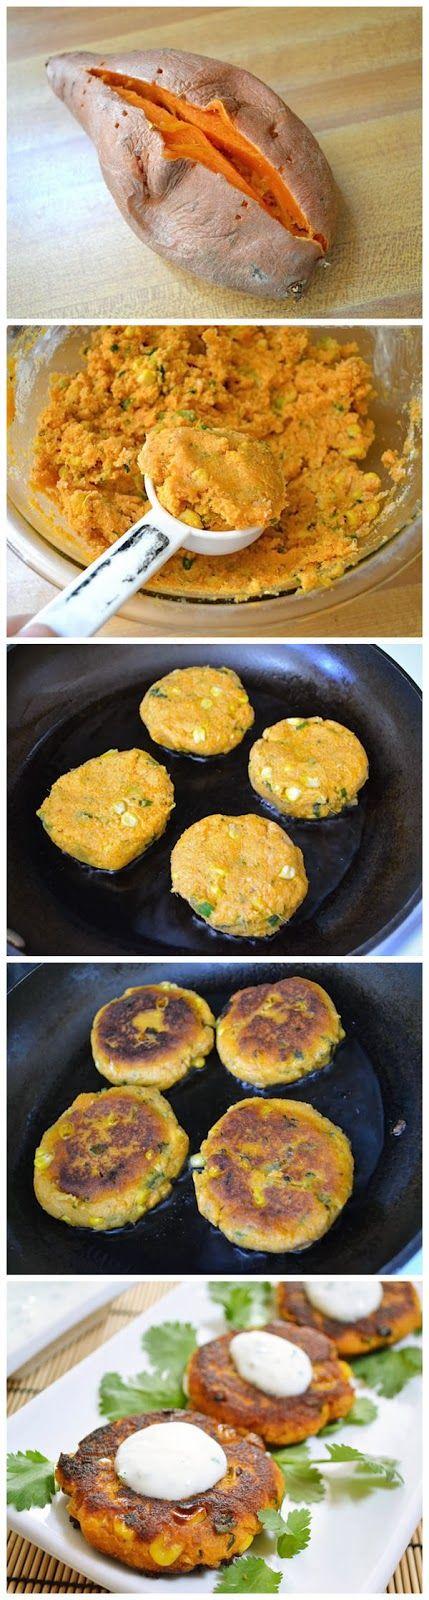 sweet potato corn cakes with garlic dipping sauce - Best of Recipe